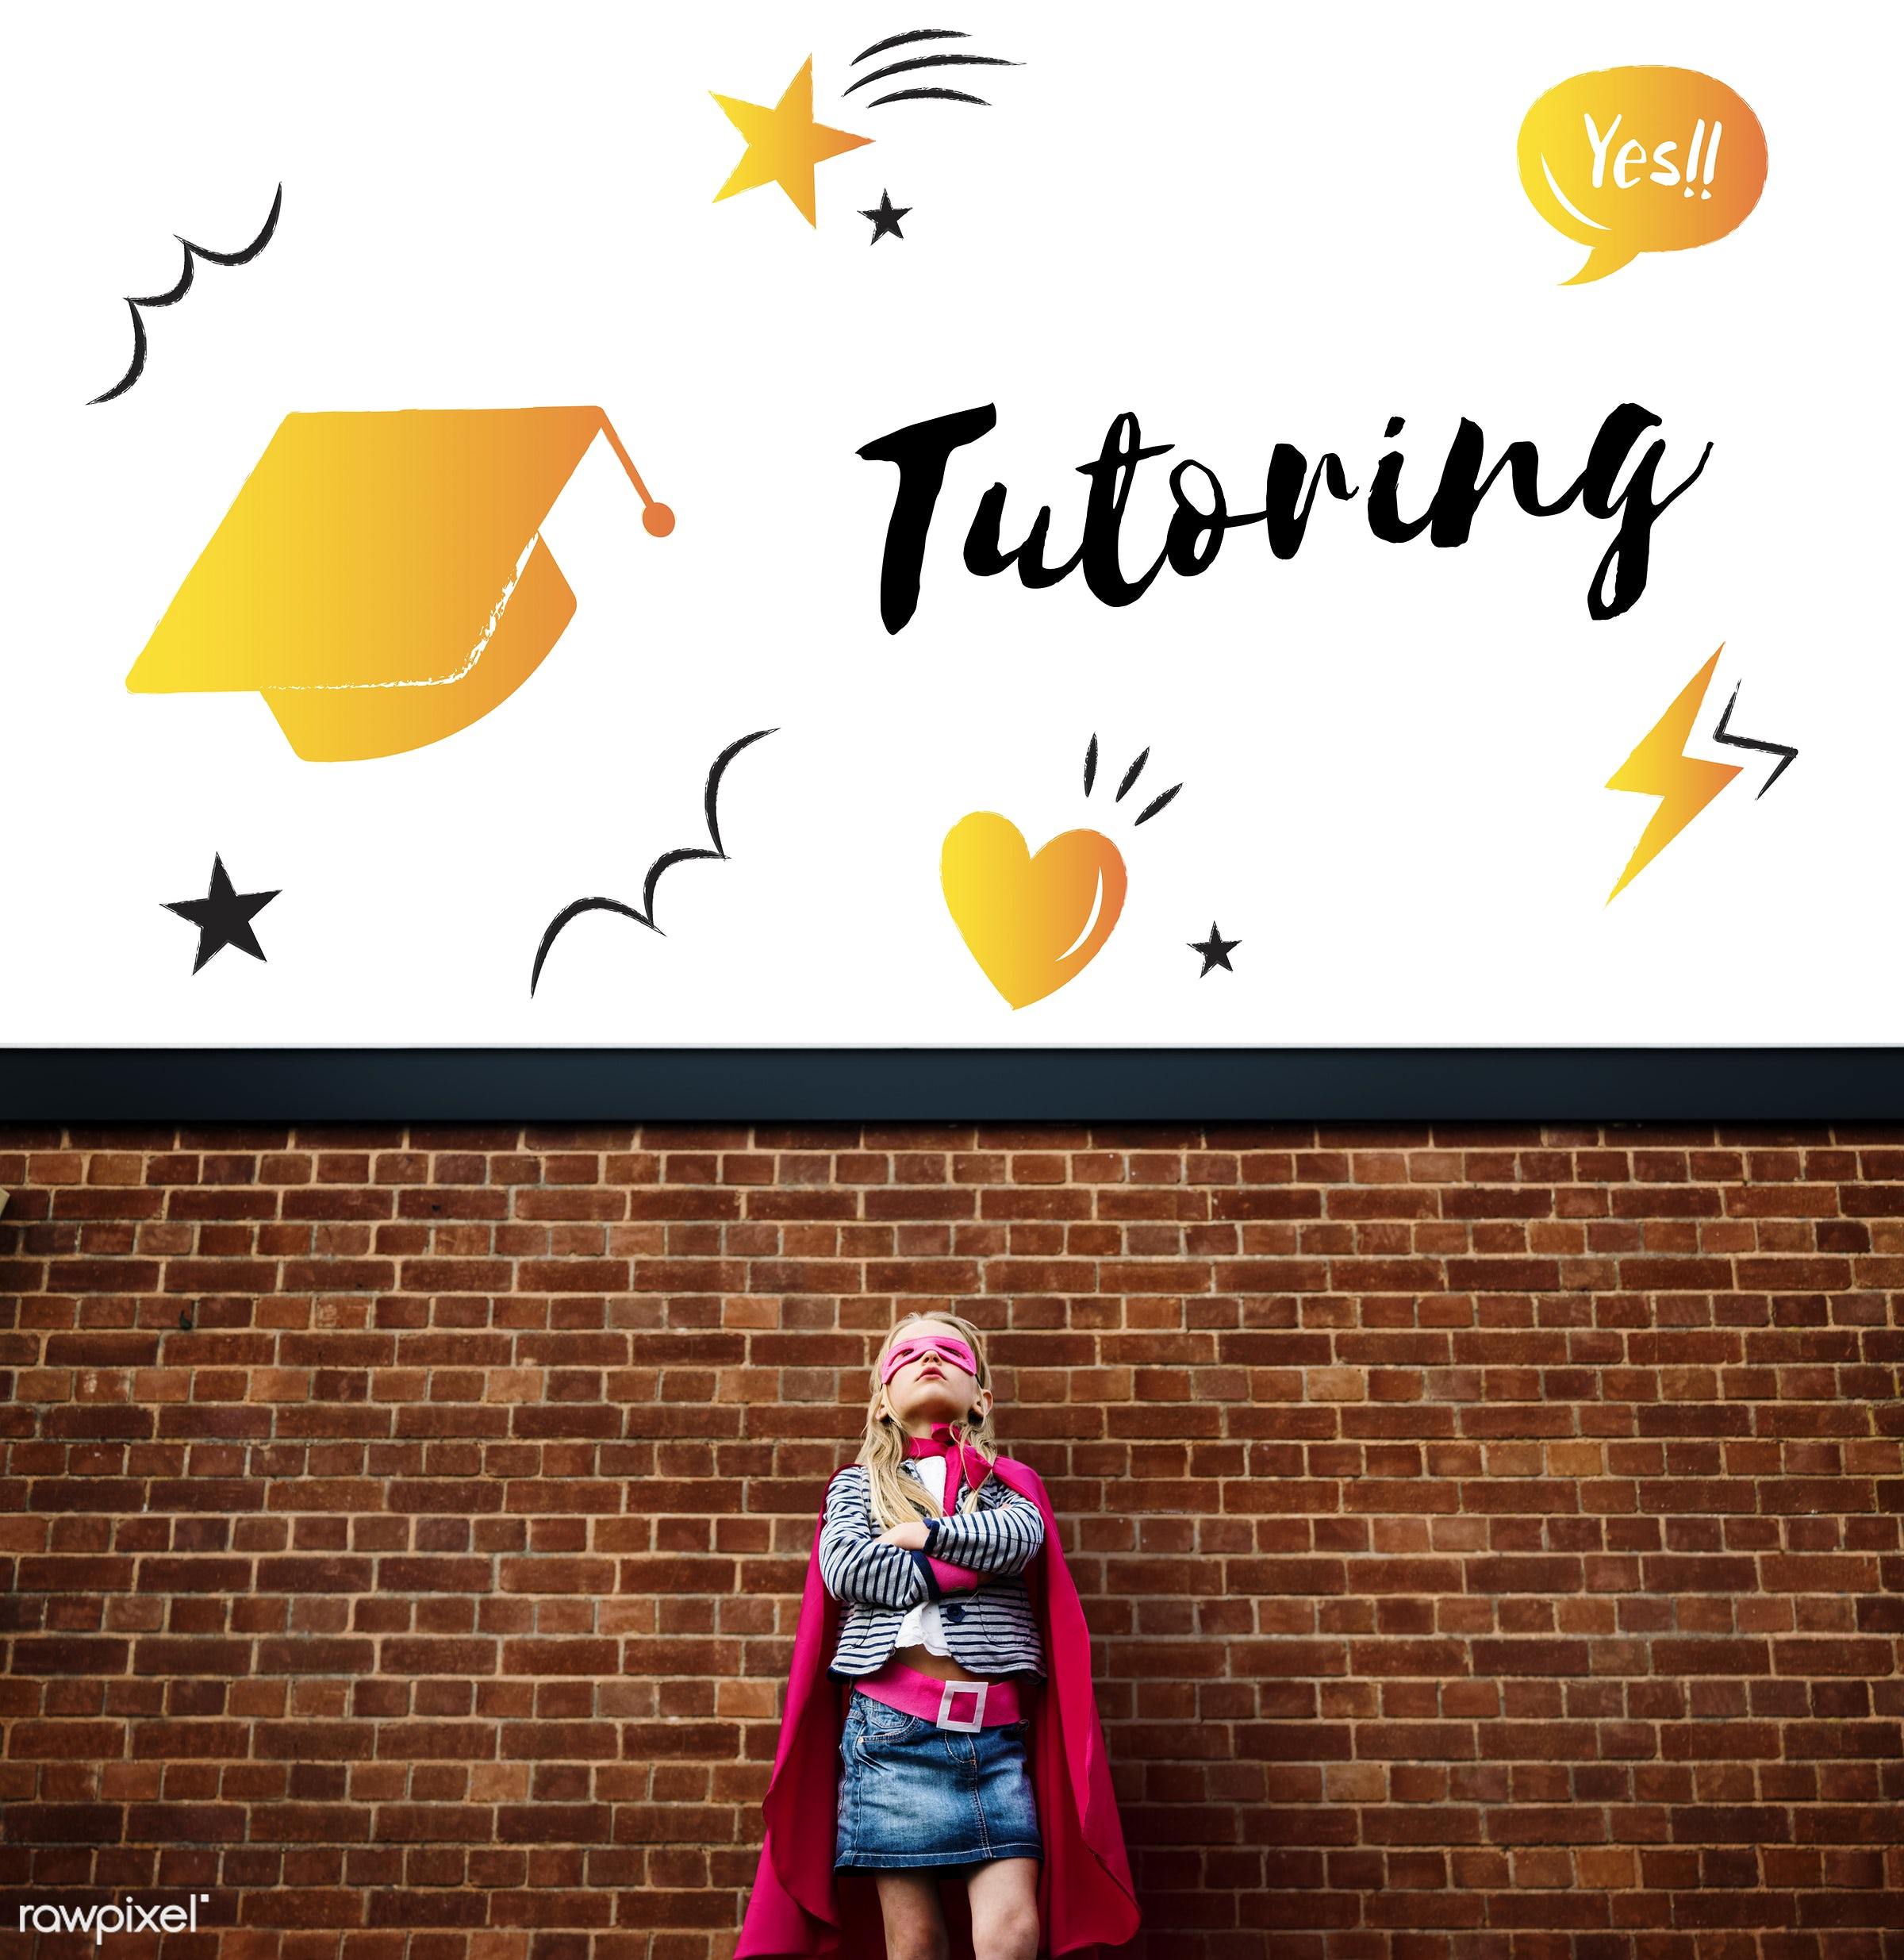 academics, active, brave, cap, child, childhood, costume, dream, dressed up, education, girl, graduation, graphic, hero,...